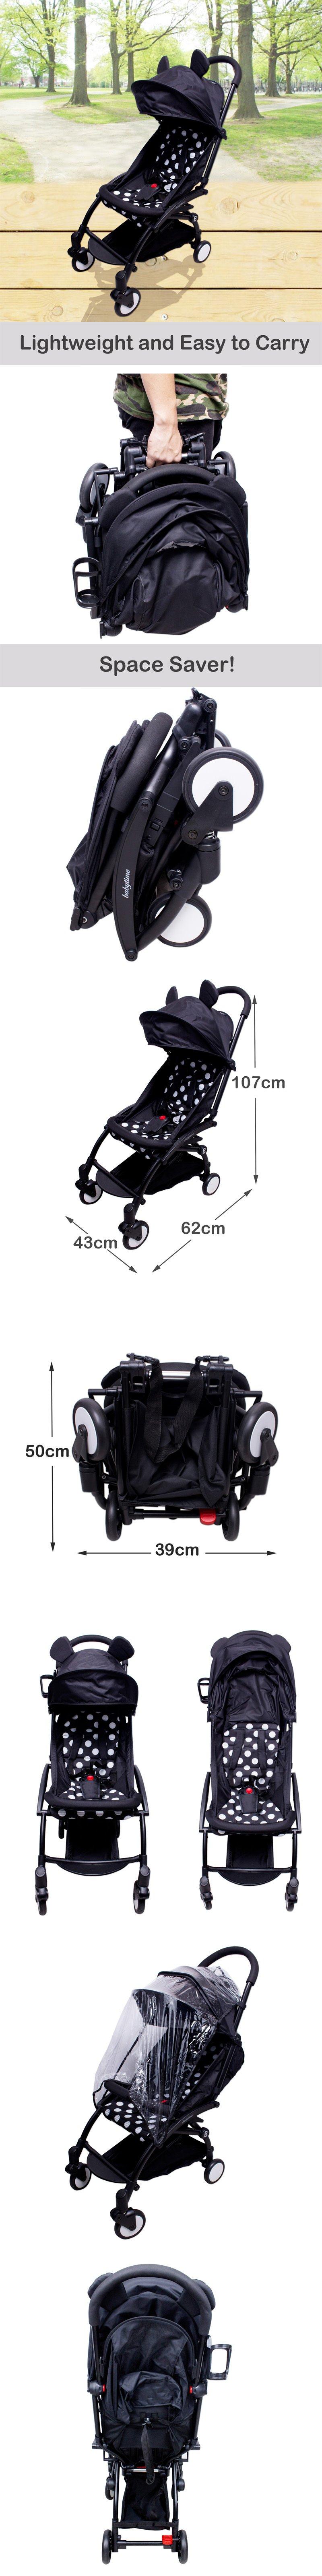 Infant Stroller Pushchairs